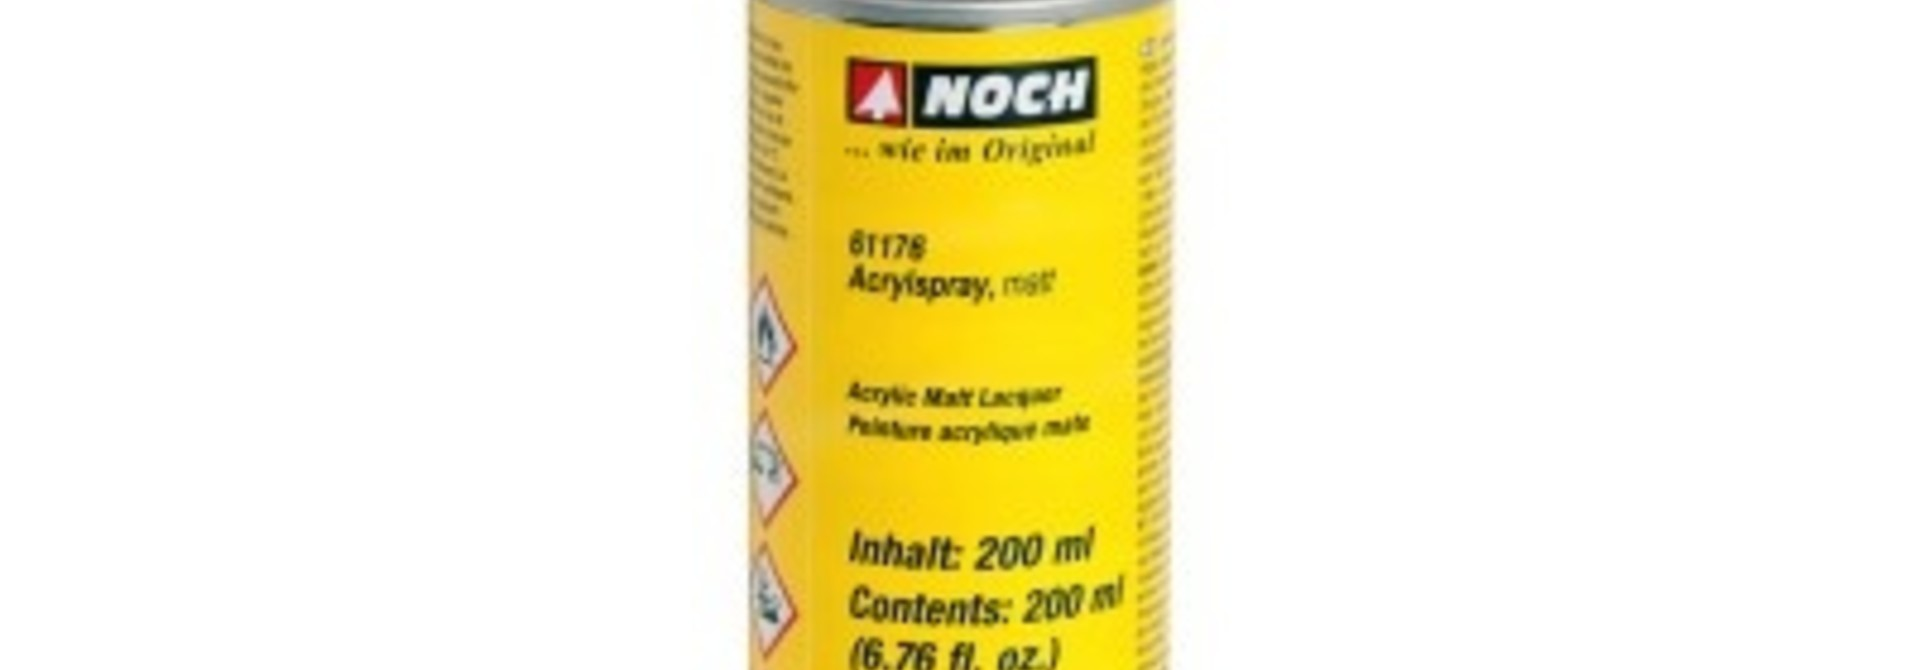 61176   Acrylspray, matt, grau